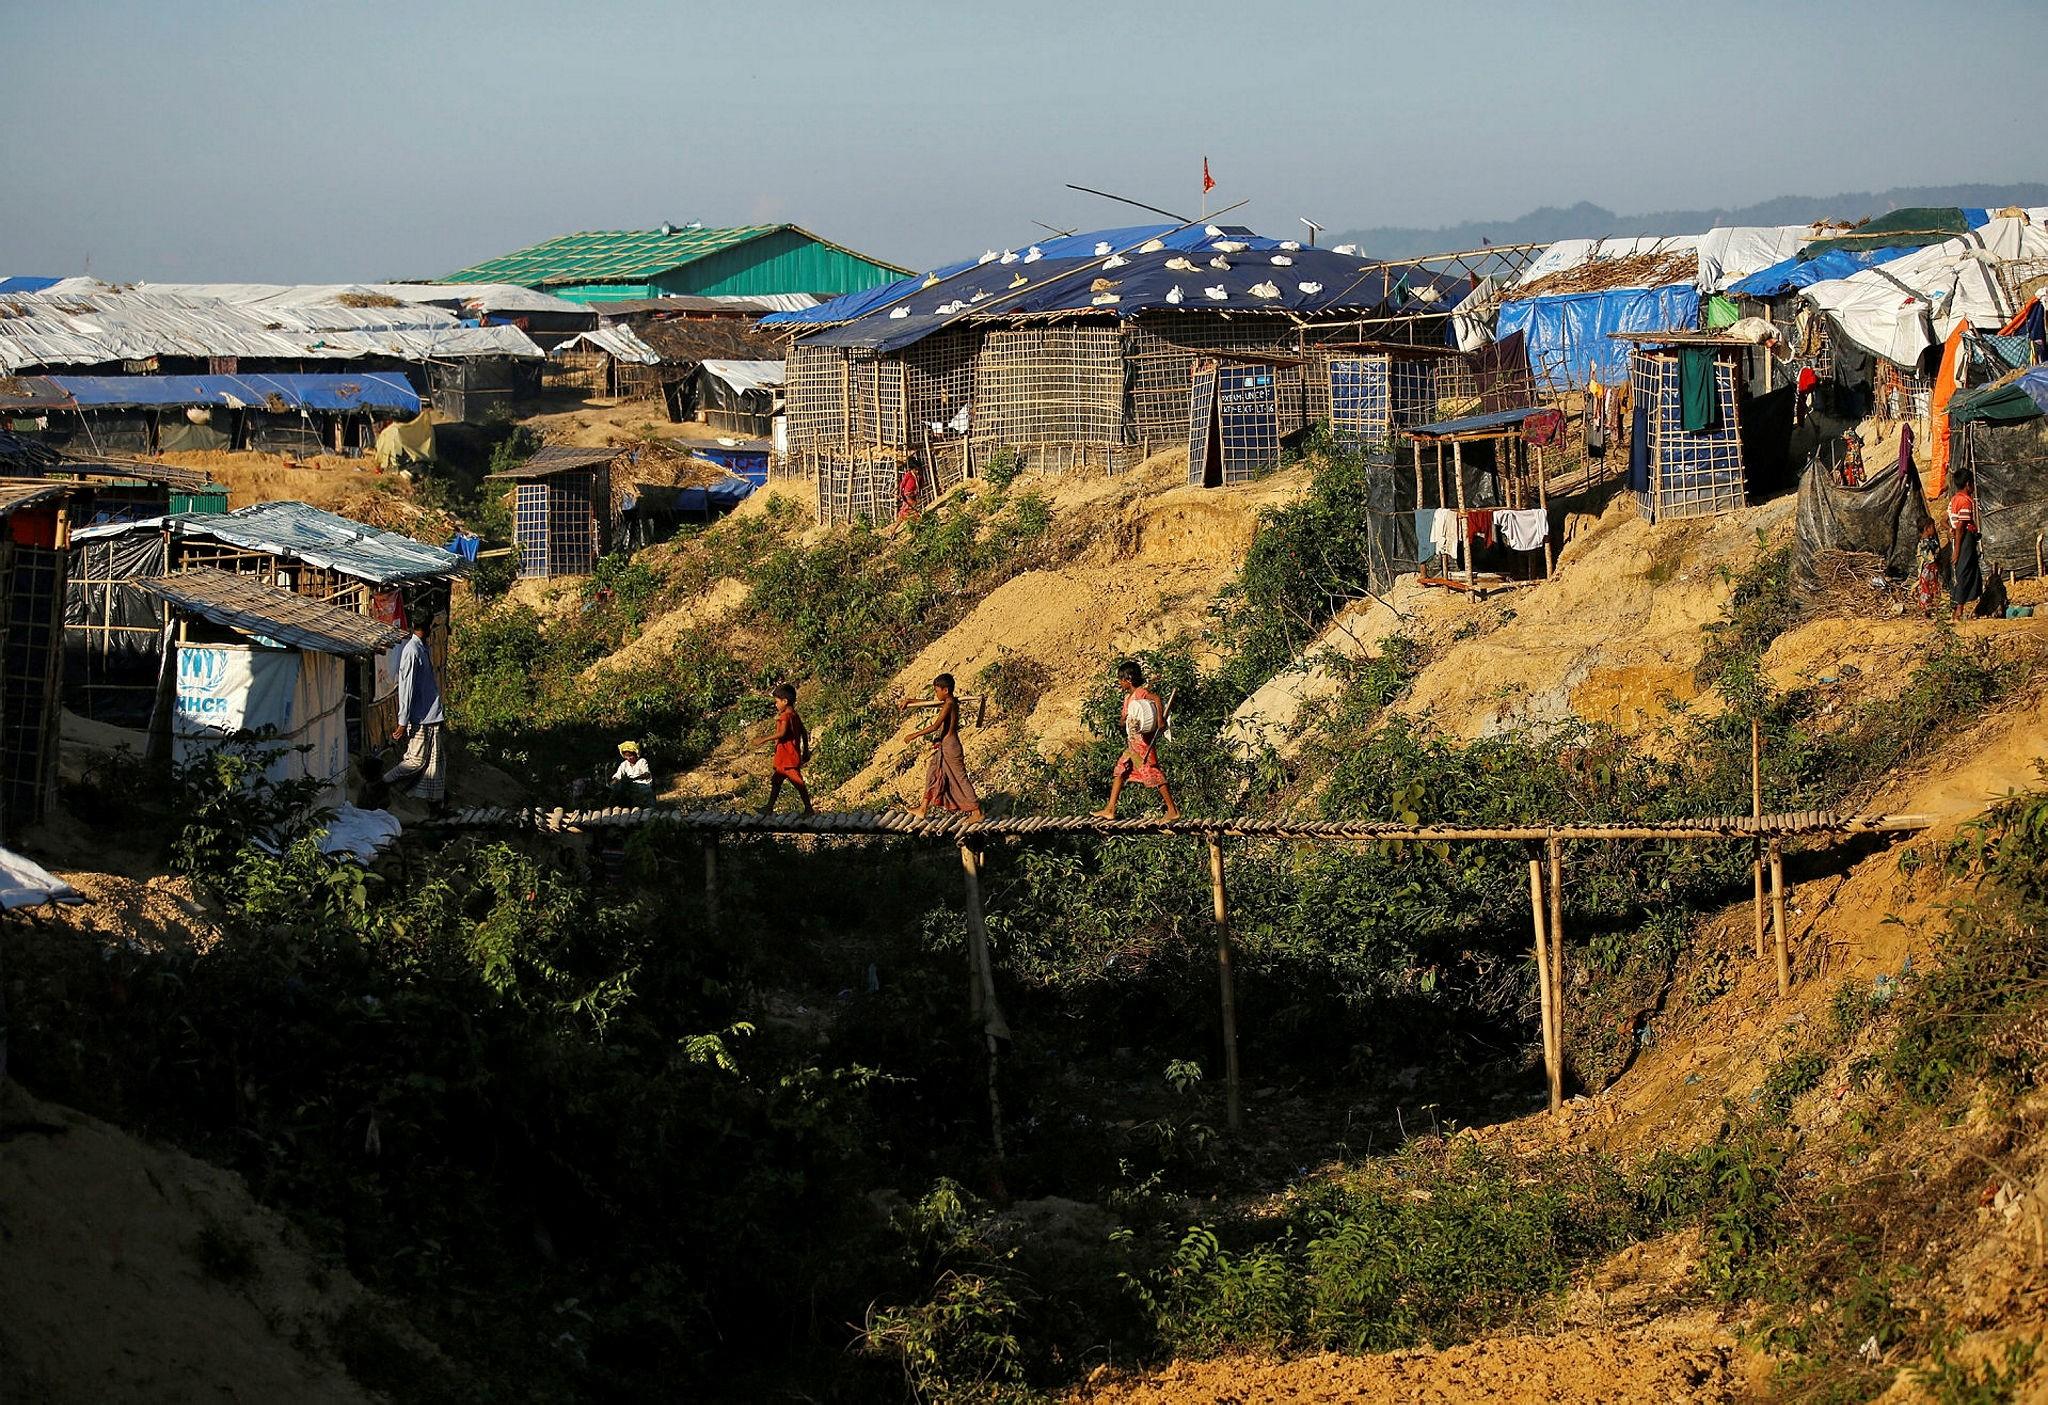 Rohingya refugee children cross a bamboo bridge at the Kutupalong refugee camp near Cox's Bazar, Bangladesh, Nov. 8.